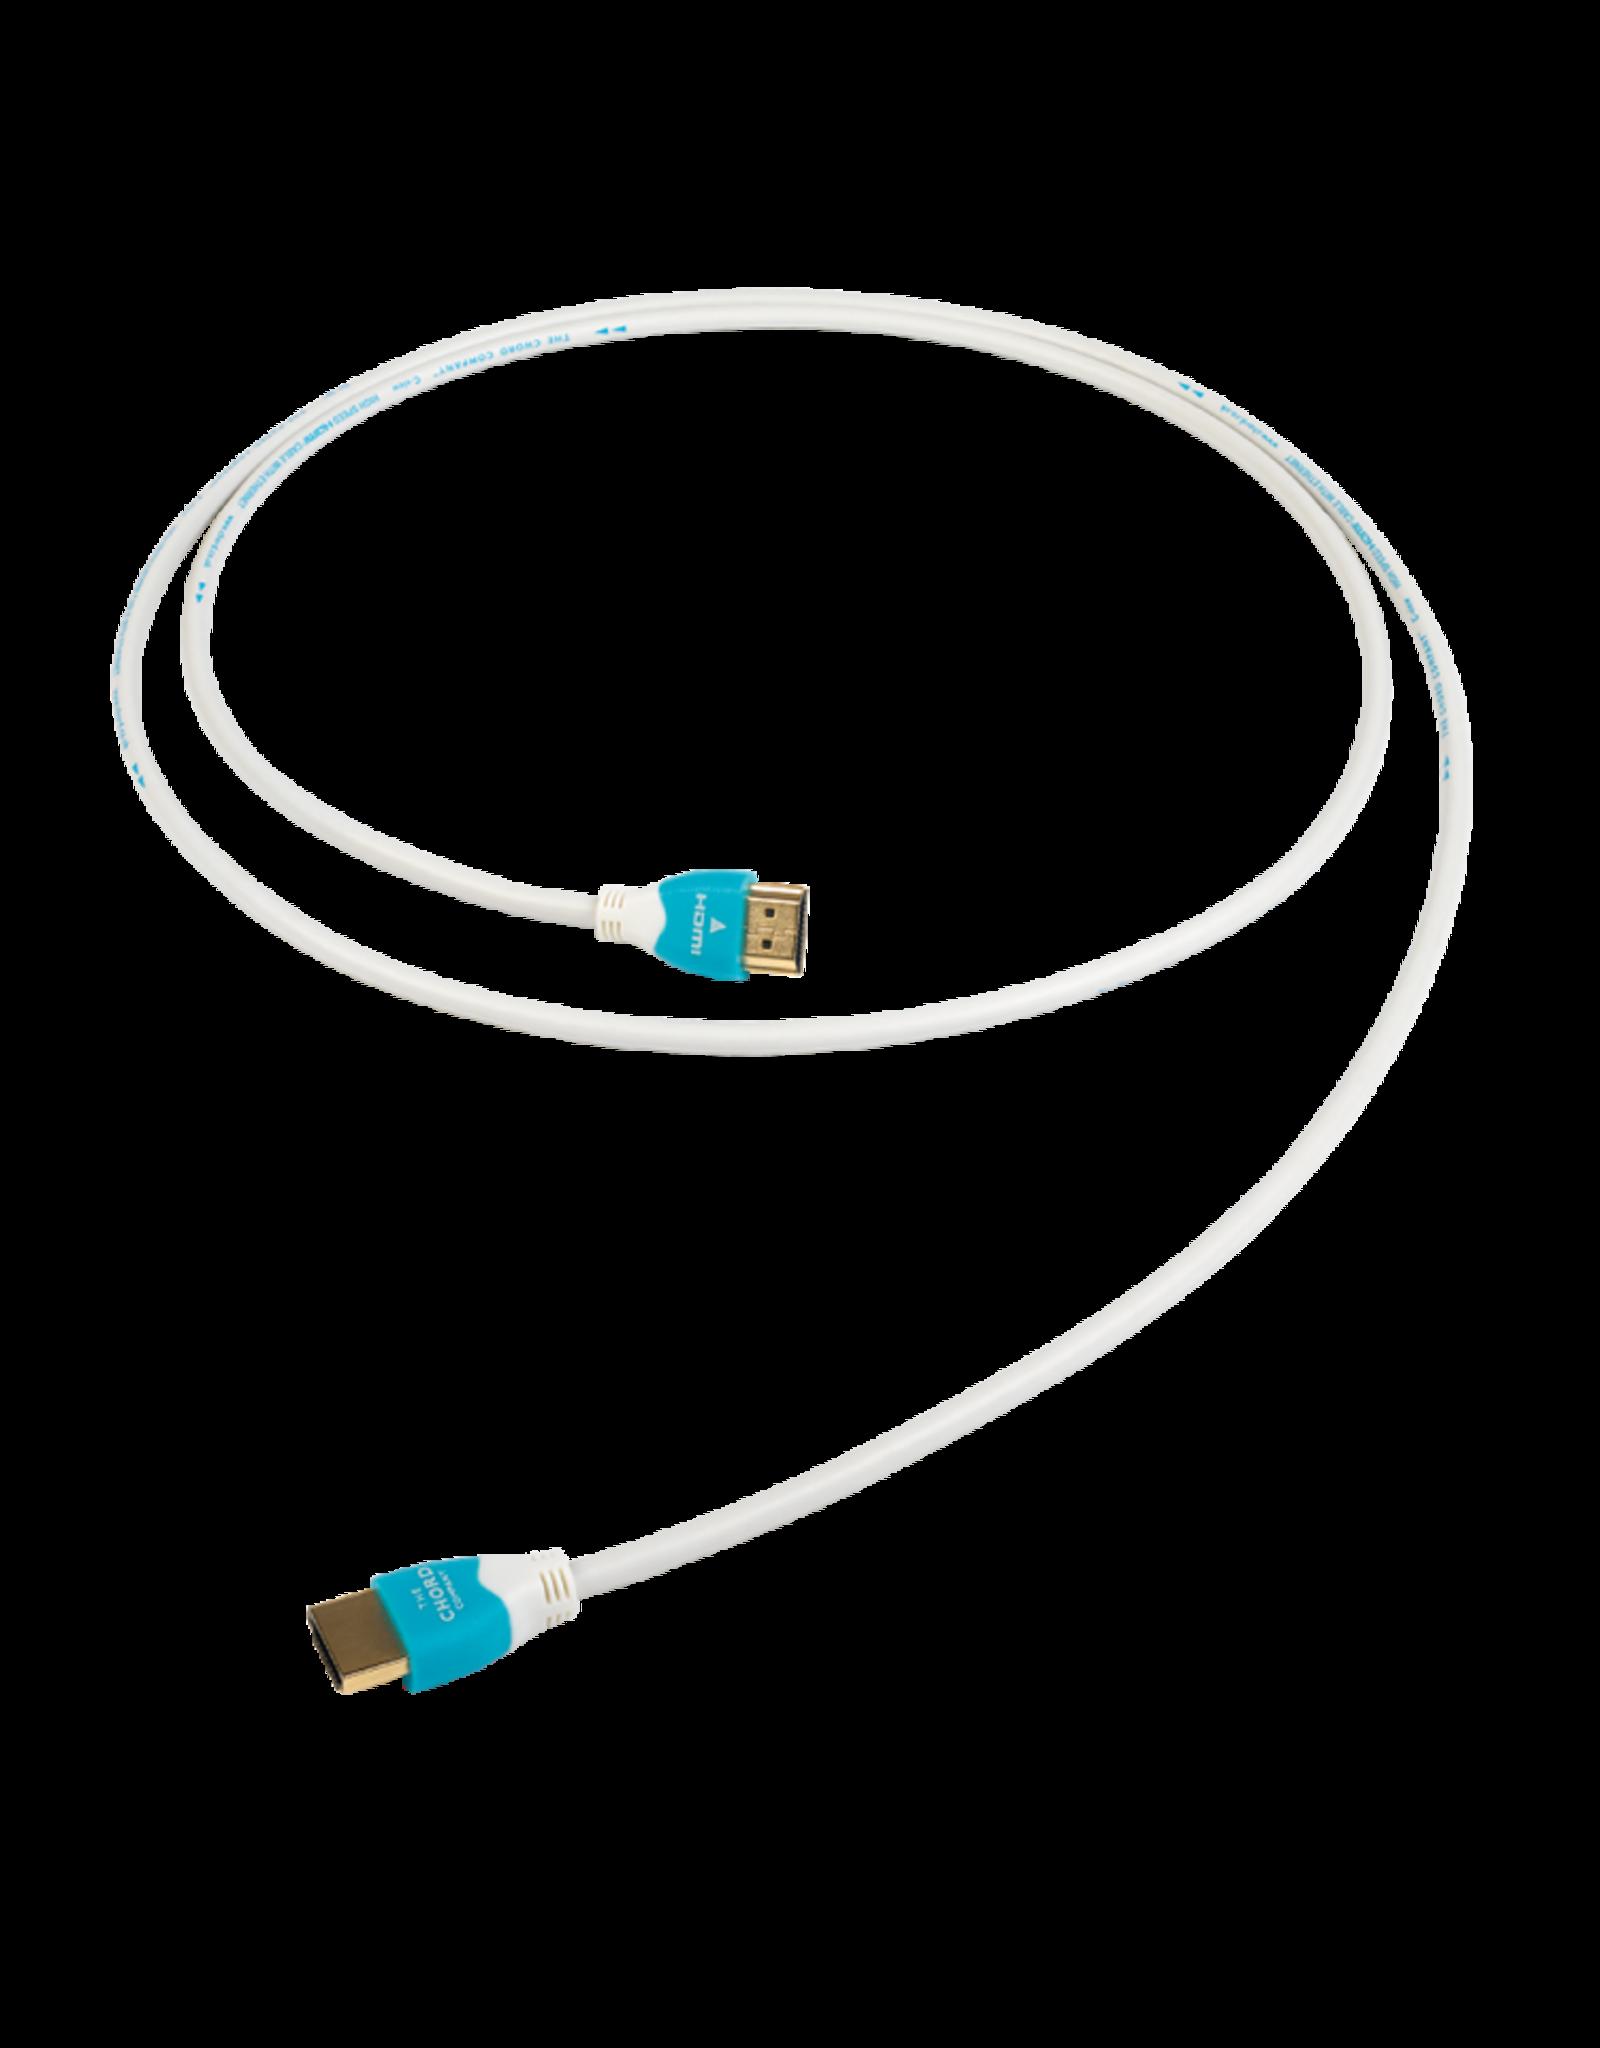 Chord Company Chord C-view 4k HDMI Cable